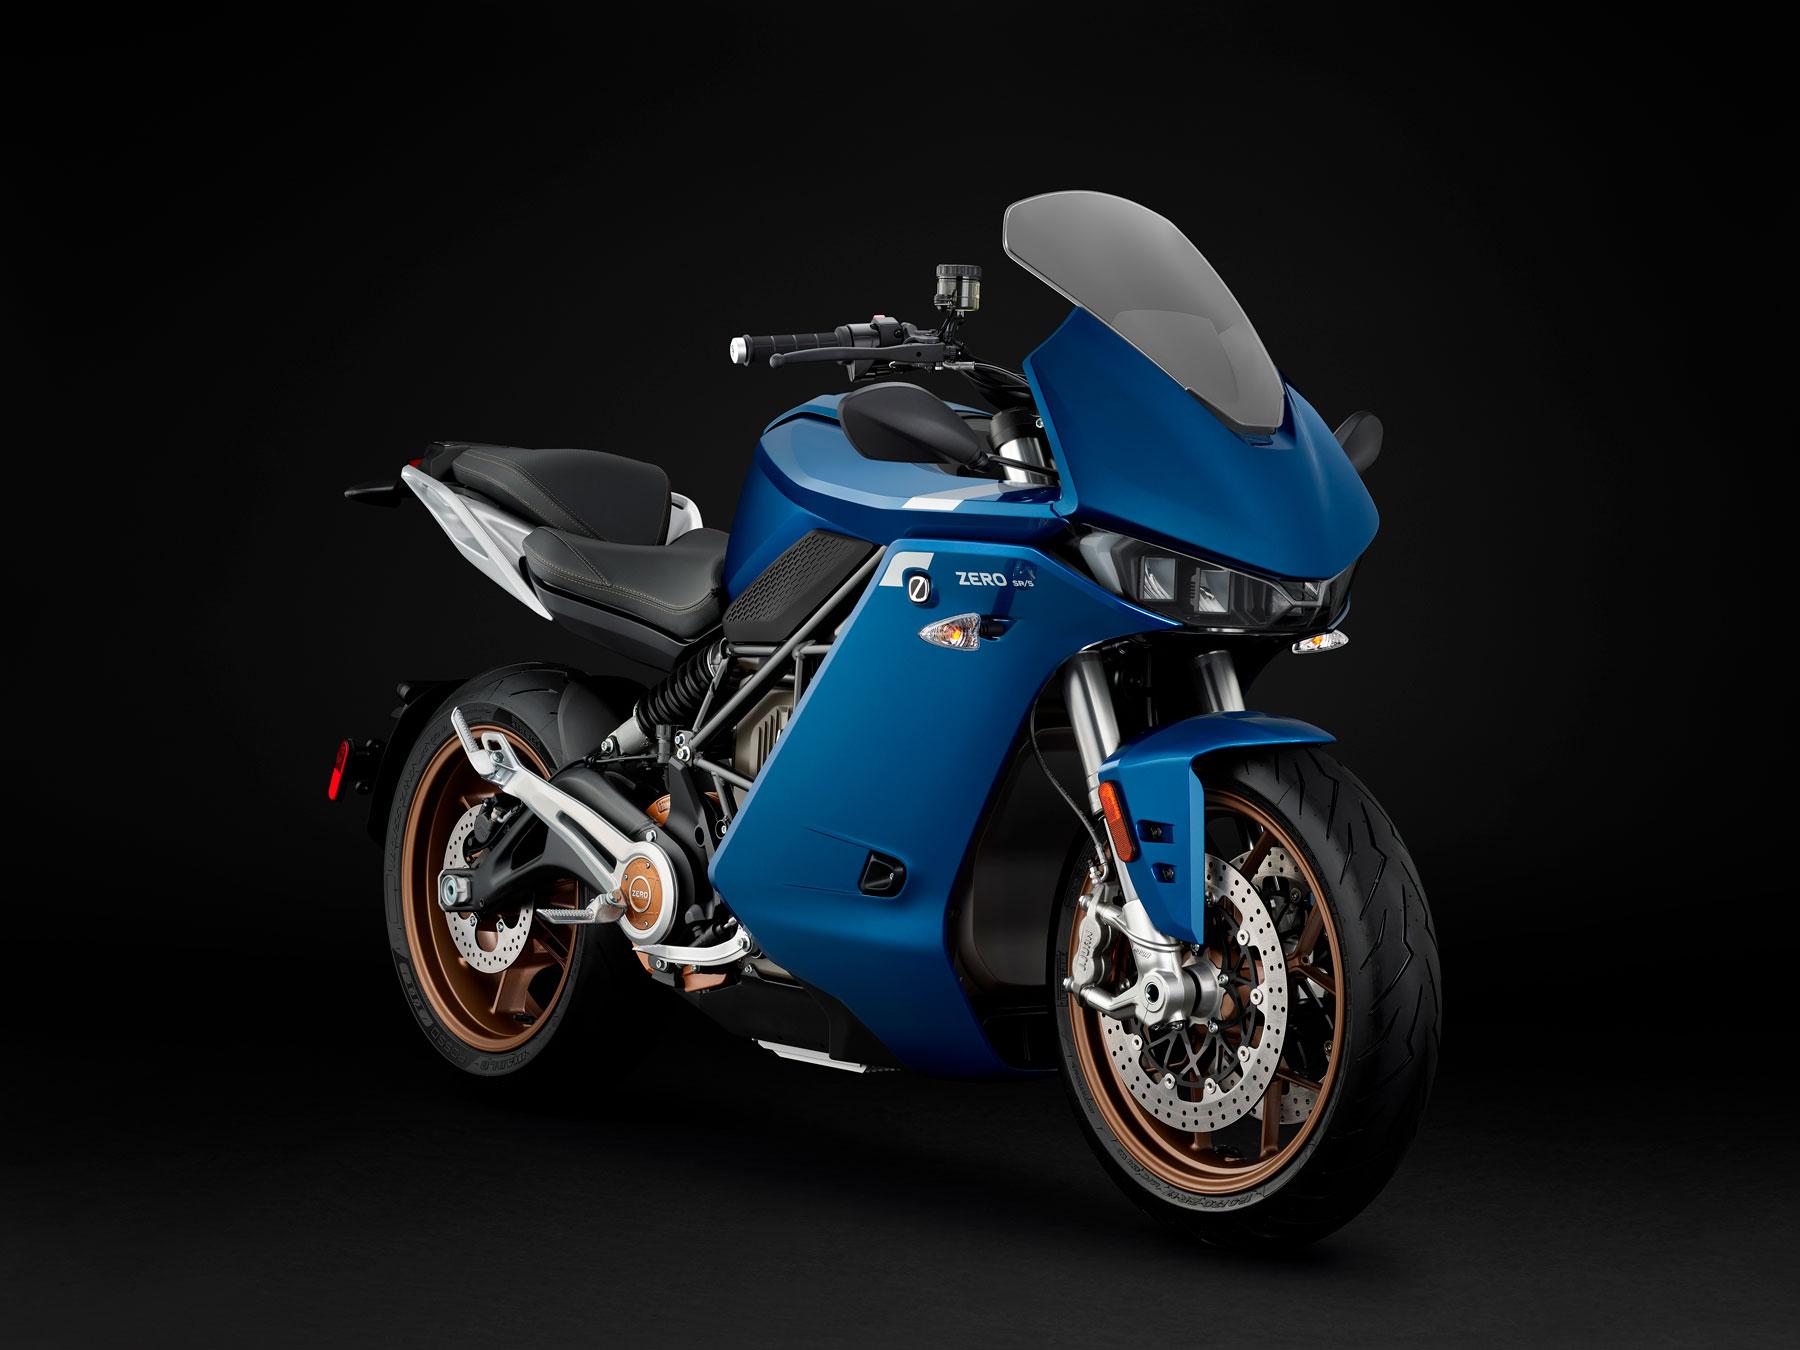 Zero SR/F (moto eléctrica) - Directomotor